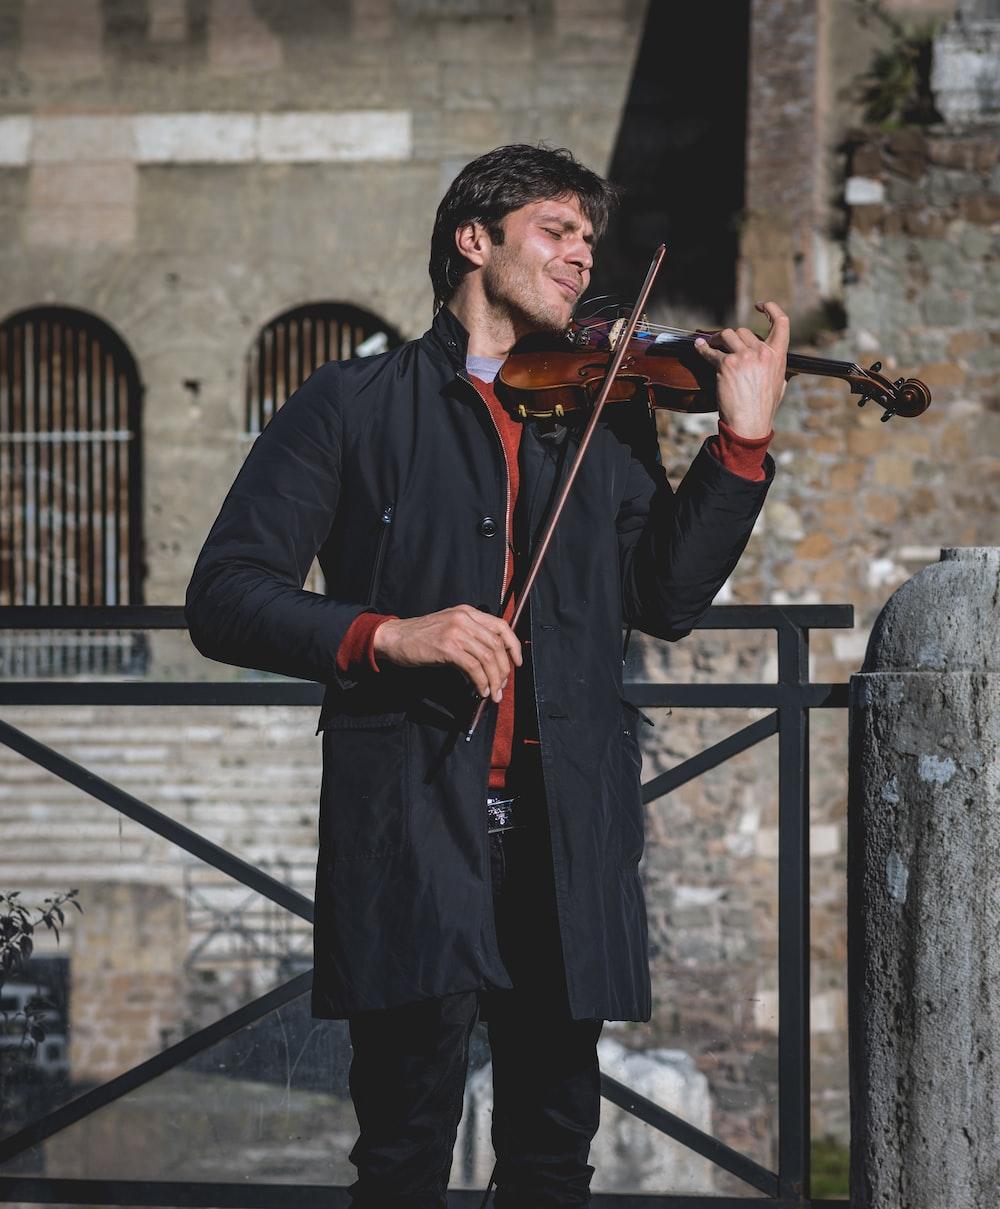 man playing violin at daytime